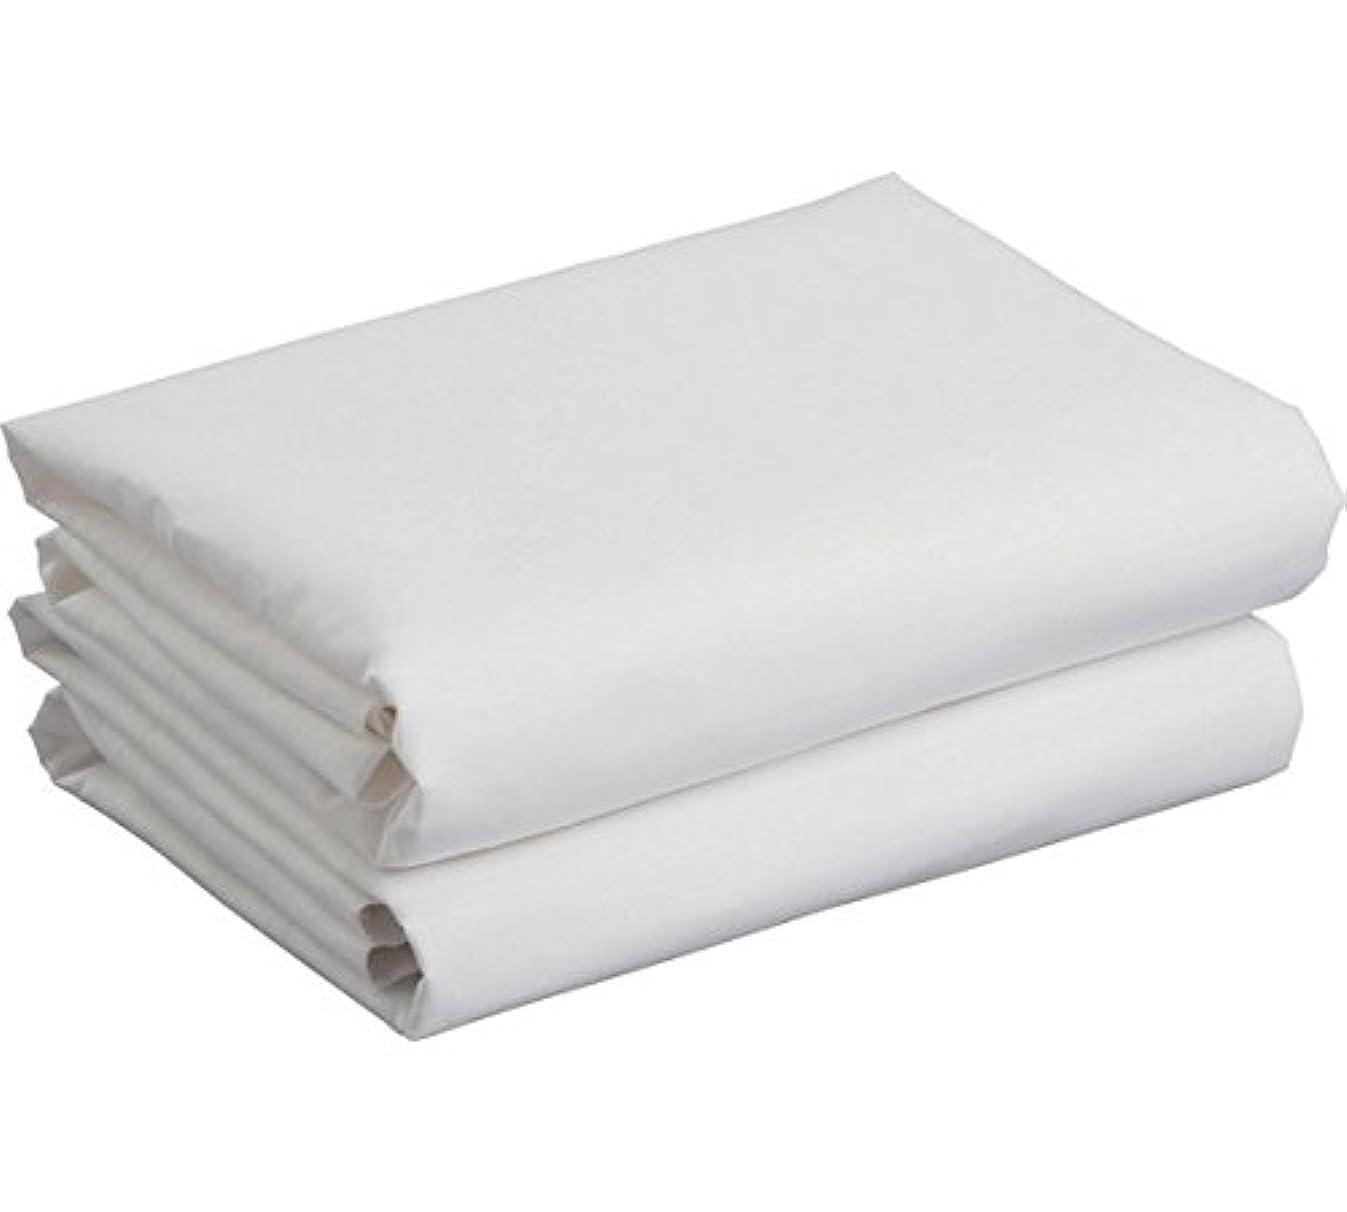 Plushy Comfort Luxury King Size Flat Sheets 1 Piece in 100% Egyptian Cotton 800 Tc